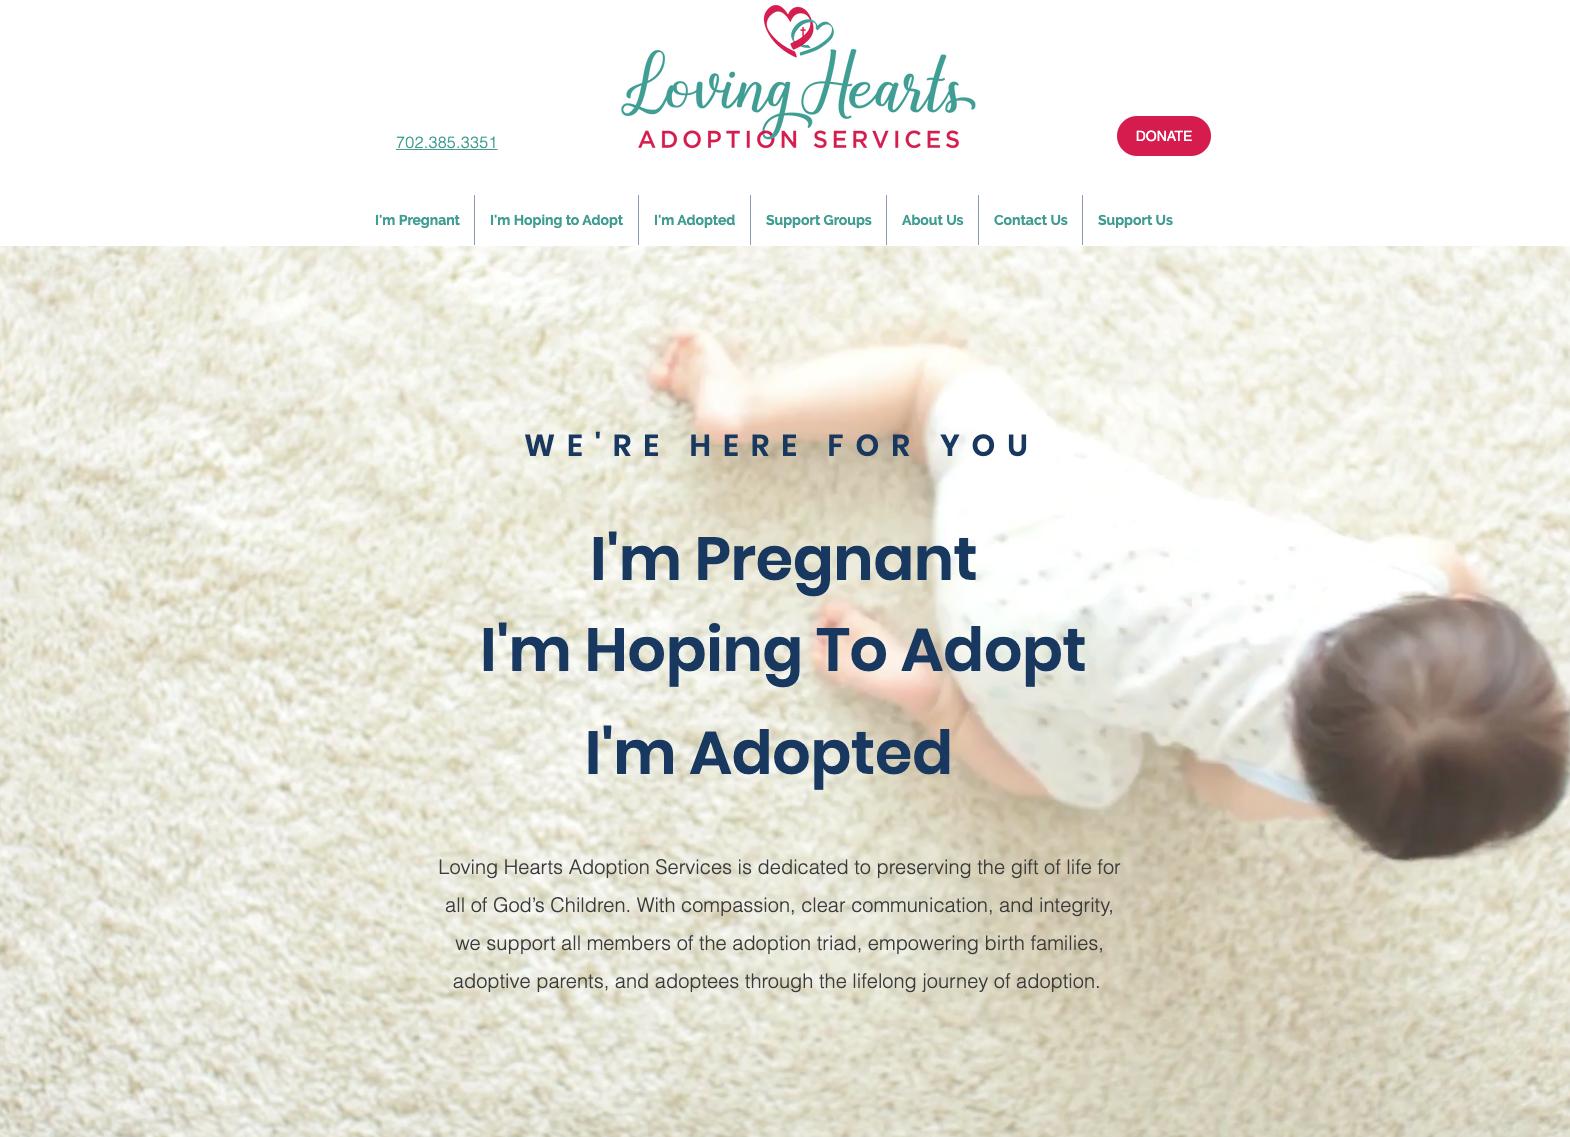 Loving Hearts Adoption Services